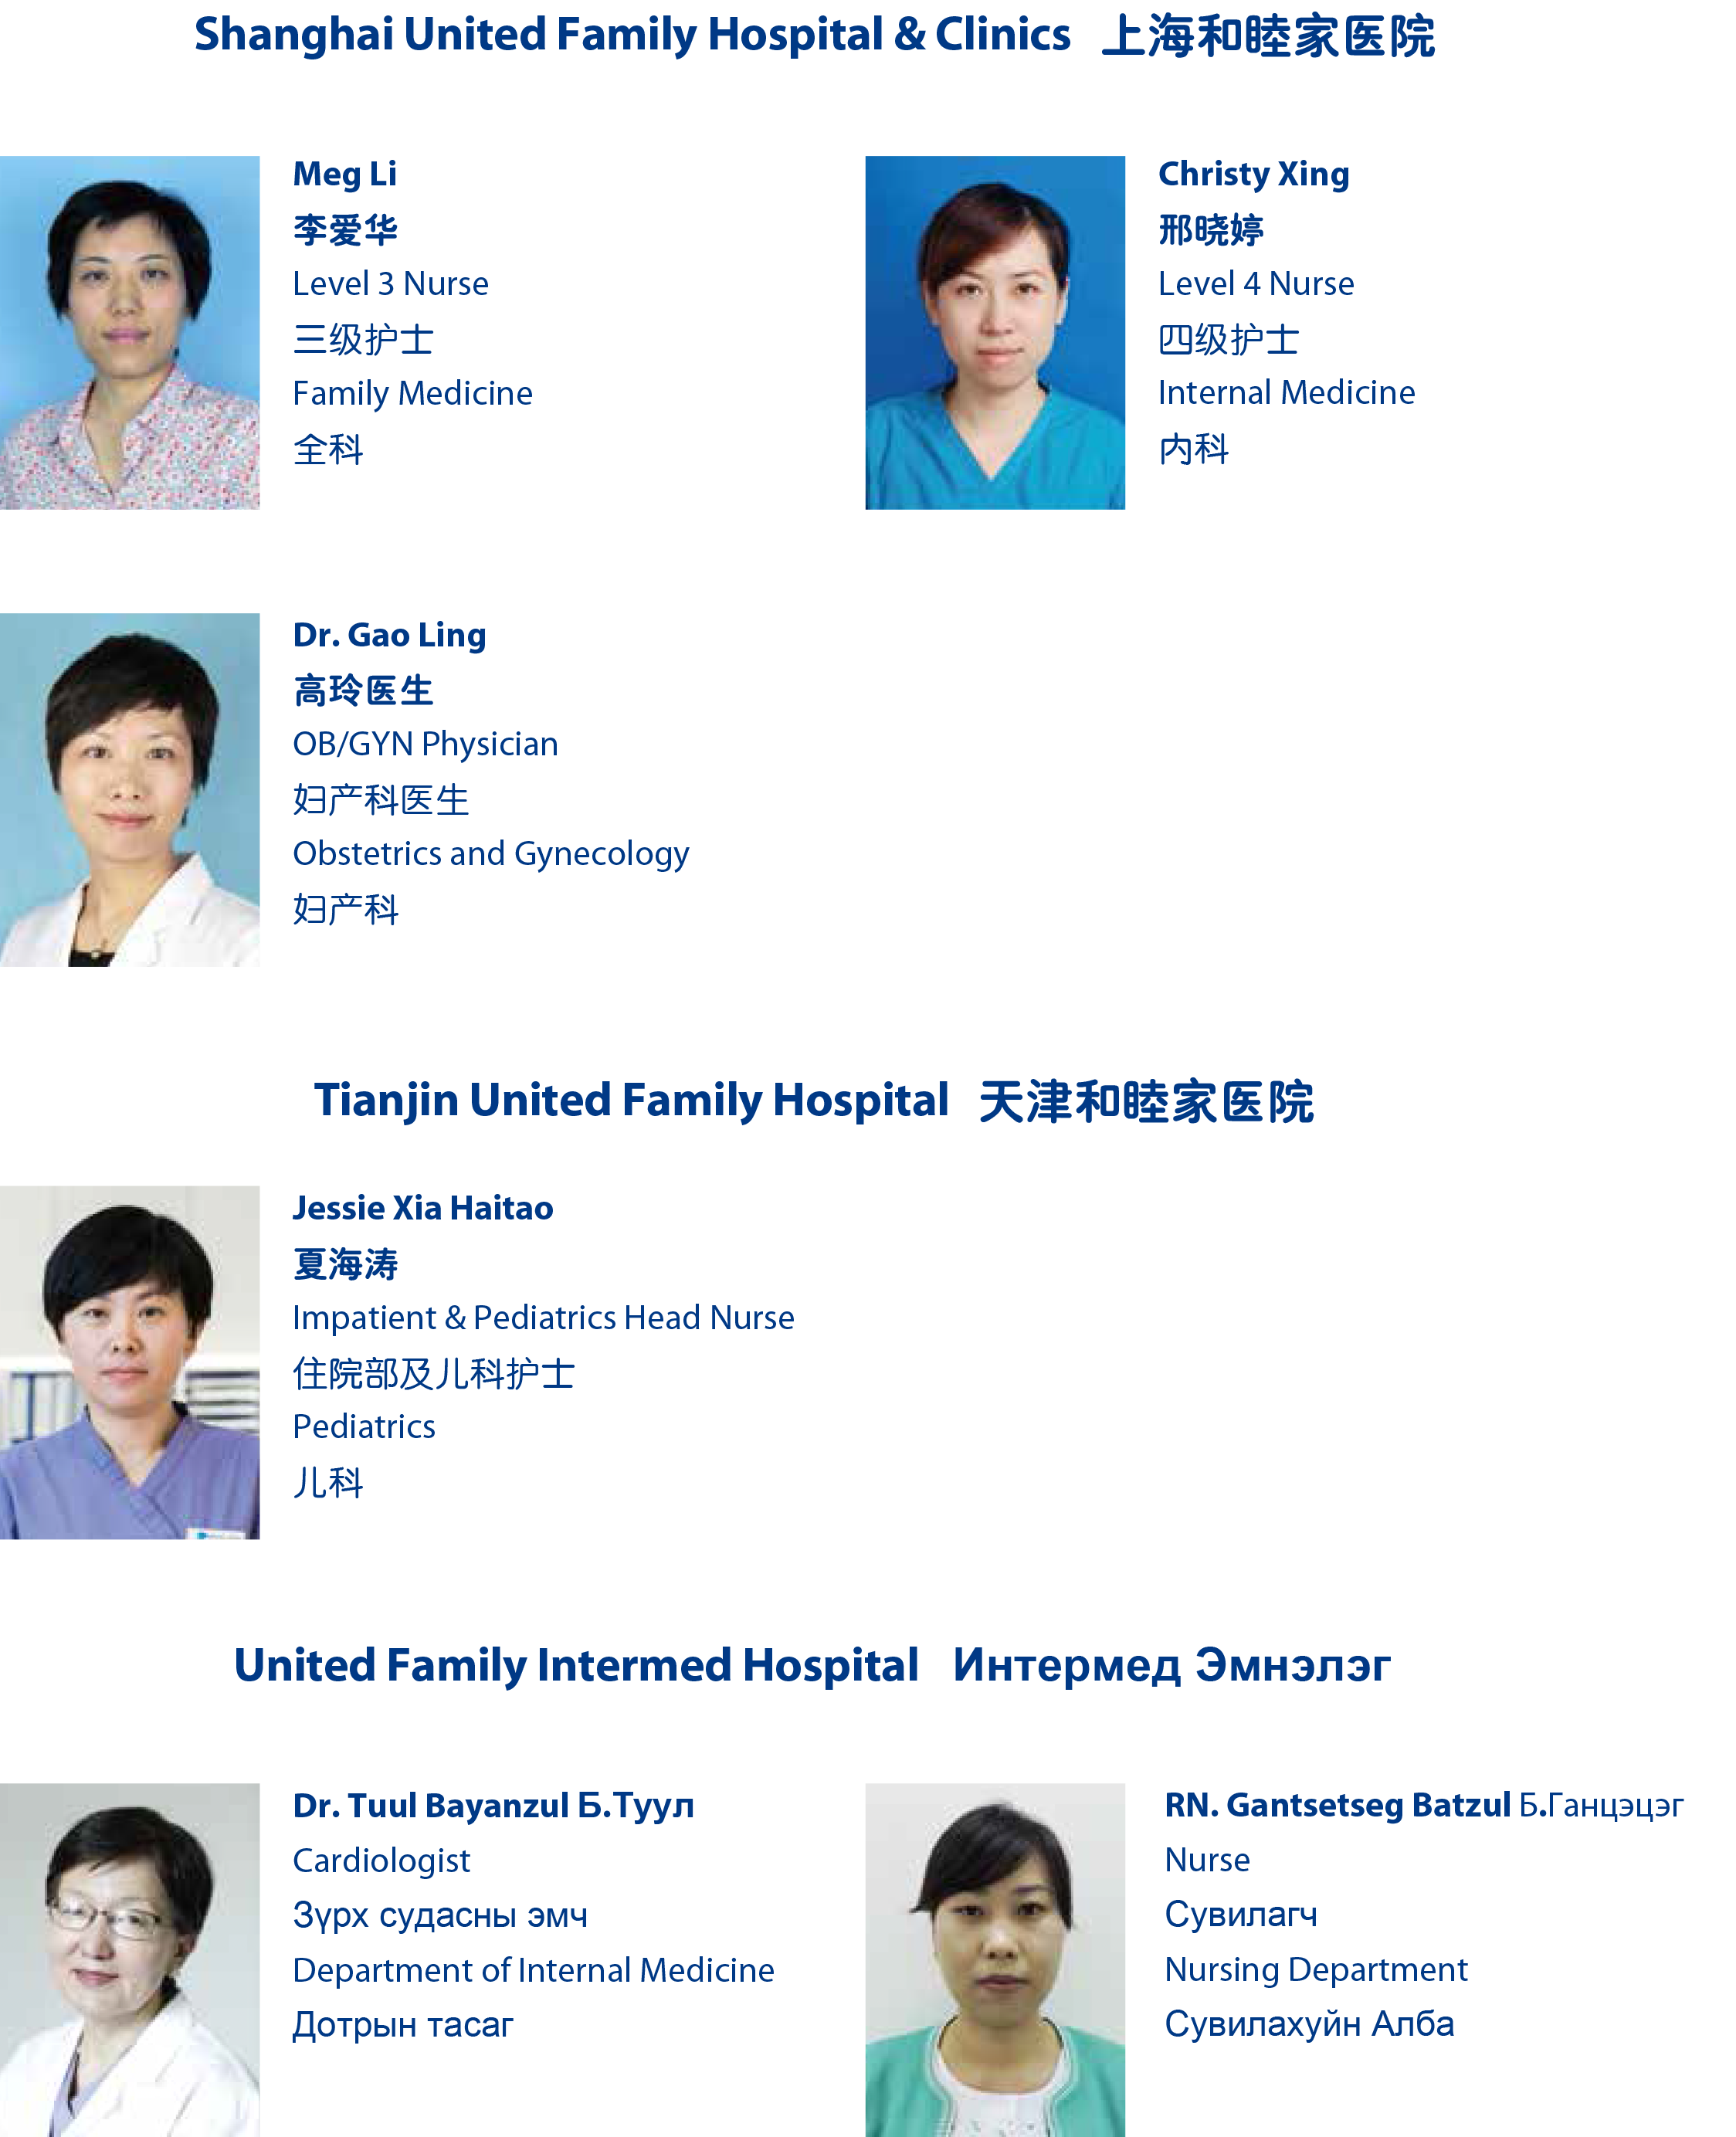 UFH_star-clinician-Q2-2016_20160825v3-3